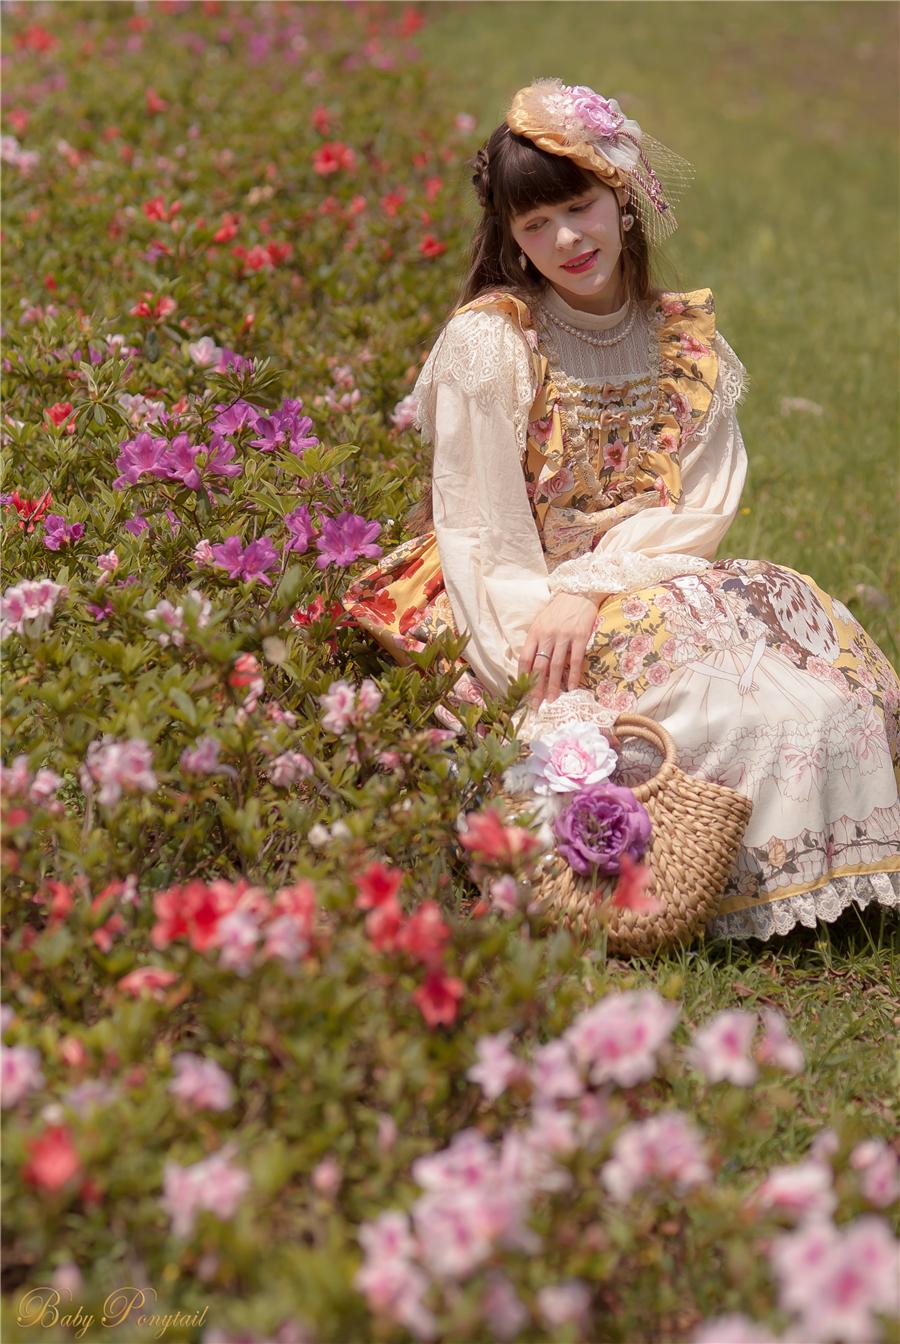 Baby Ponytail_Model Photo_Polly's Garden of Dreams_JSK Yellow_Claudia_6.jpg